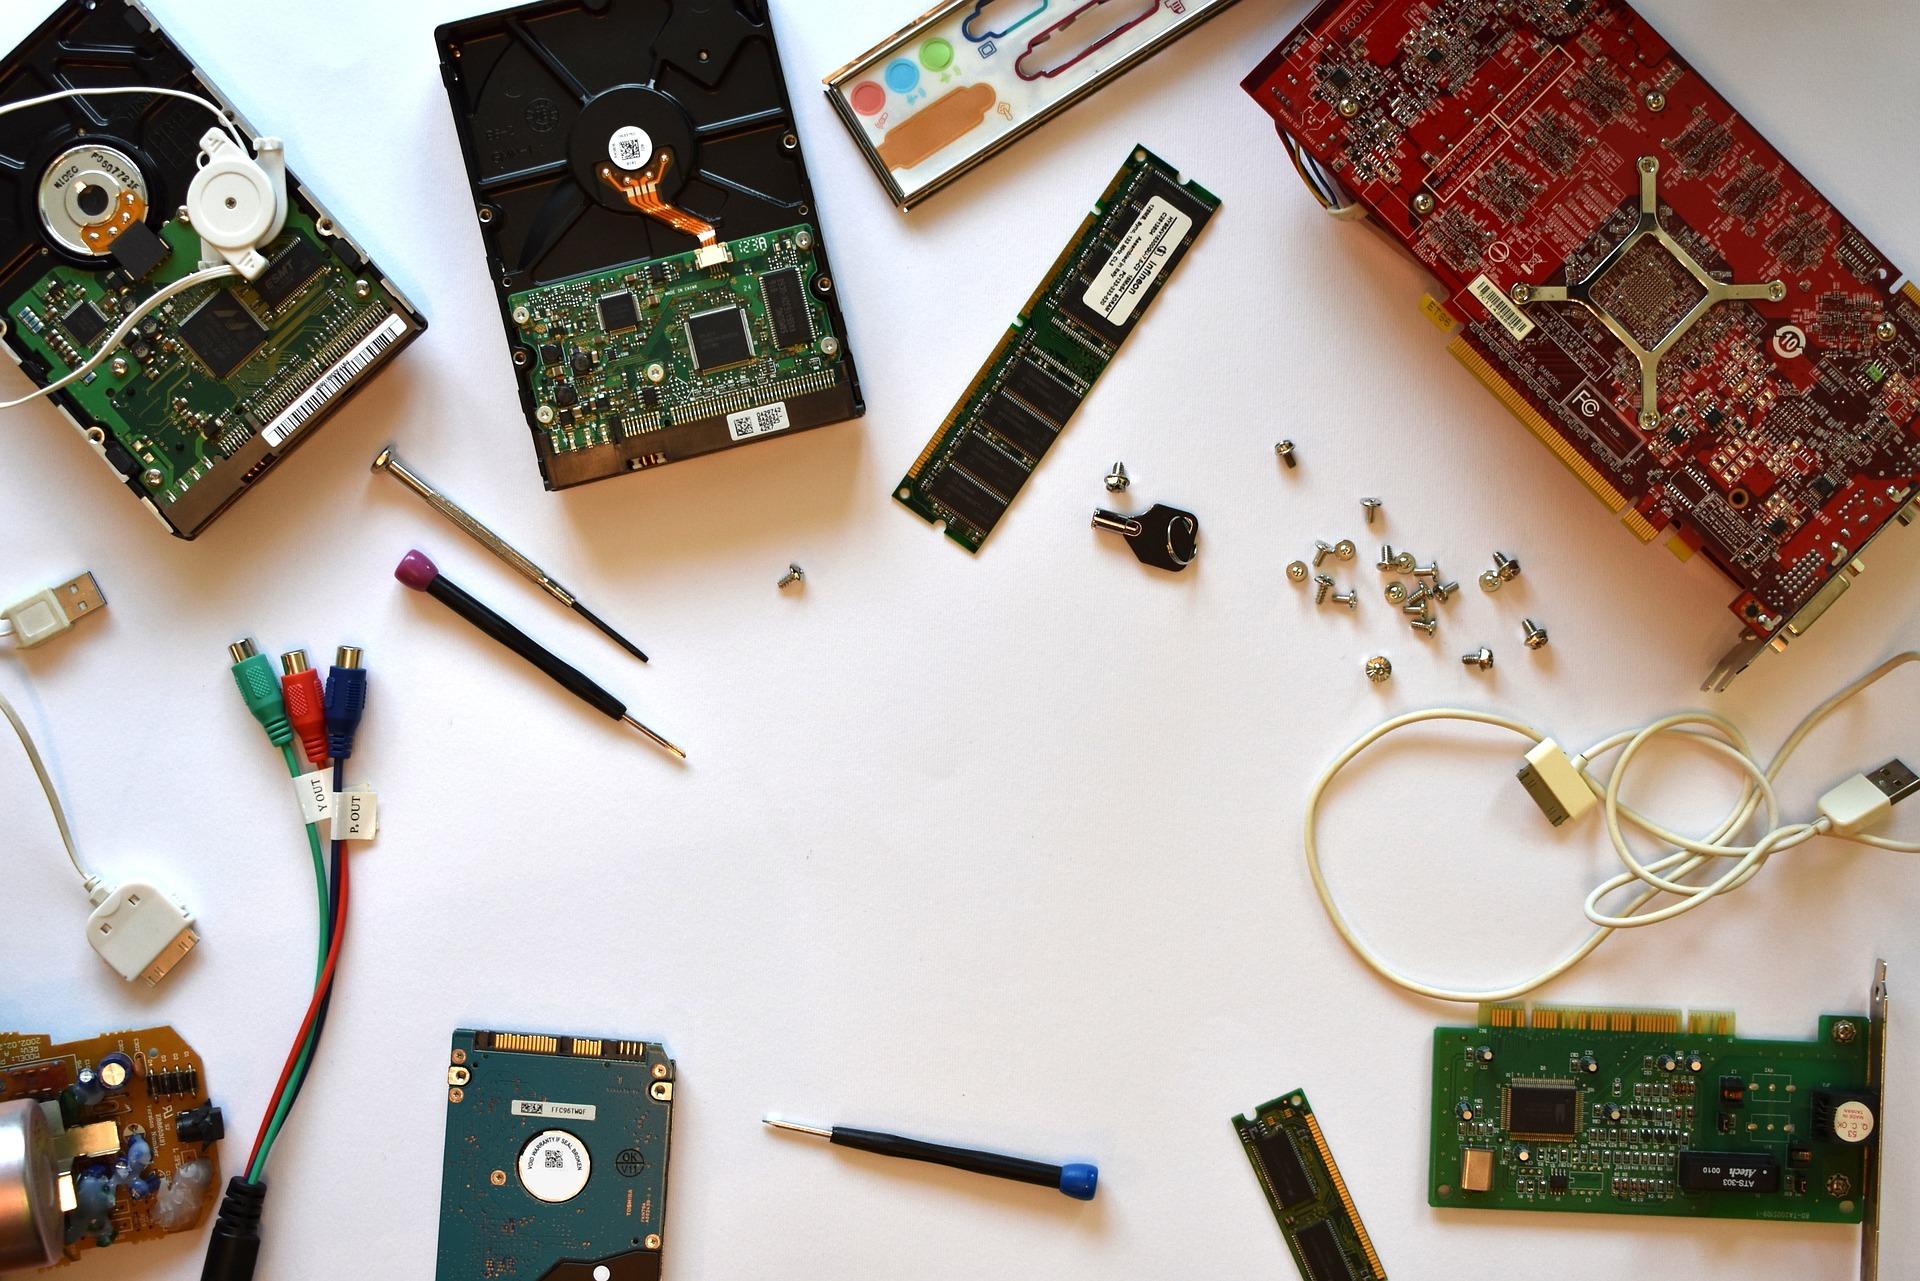 How to Spot a Good Computer Repair Shop